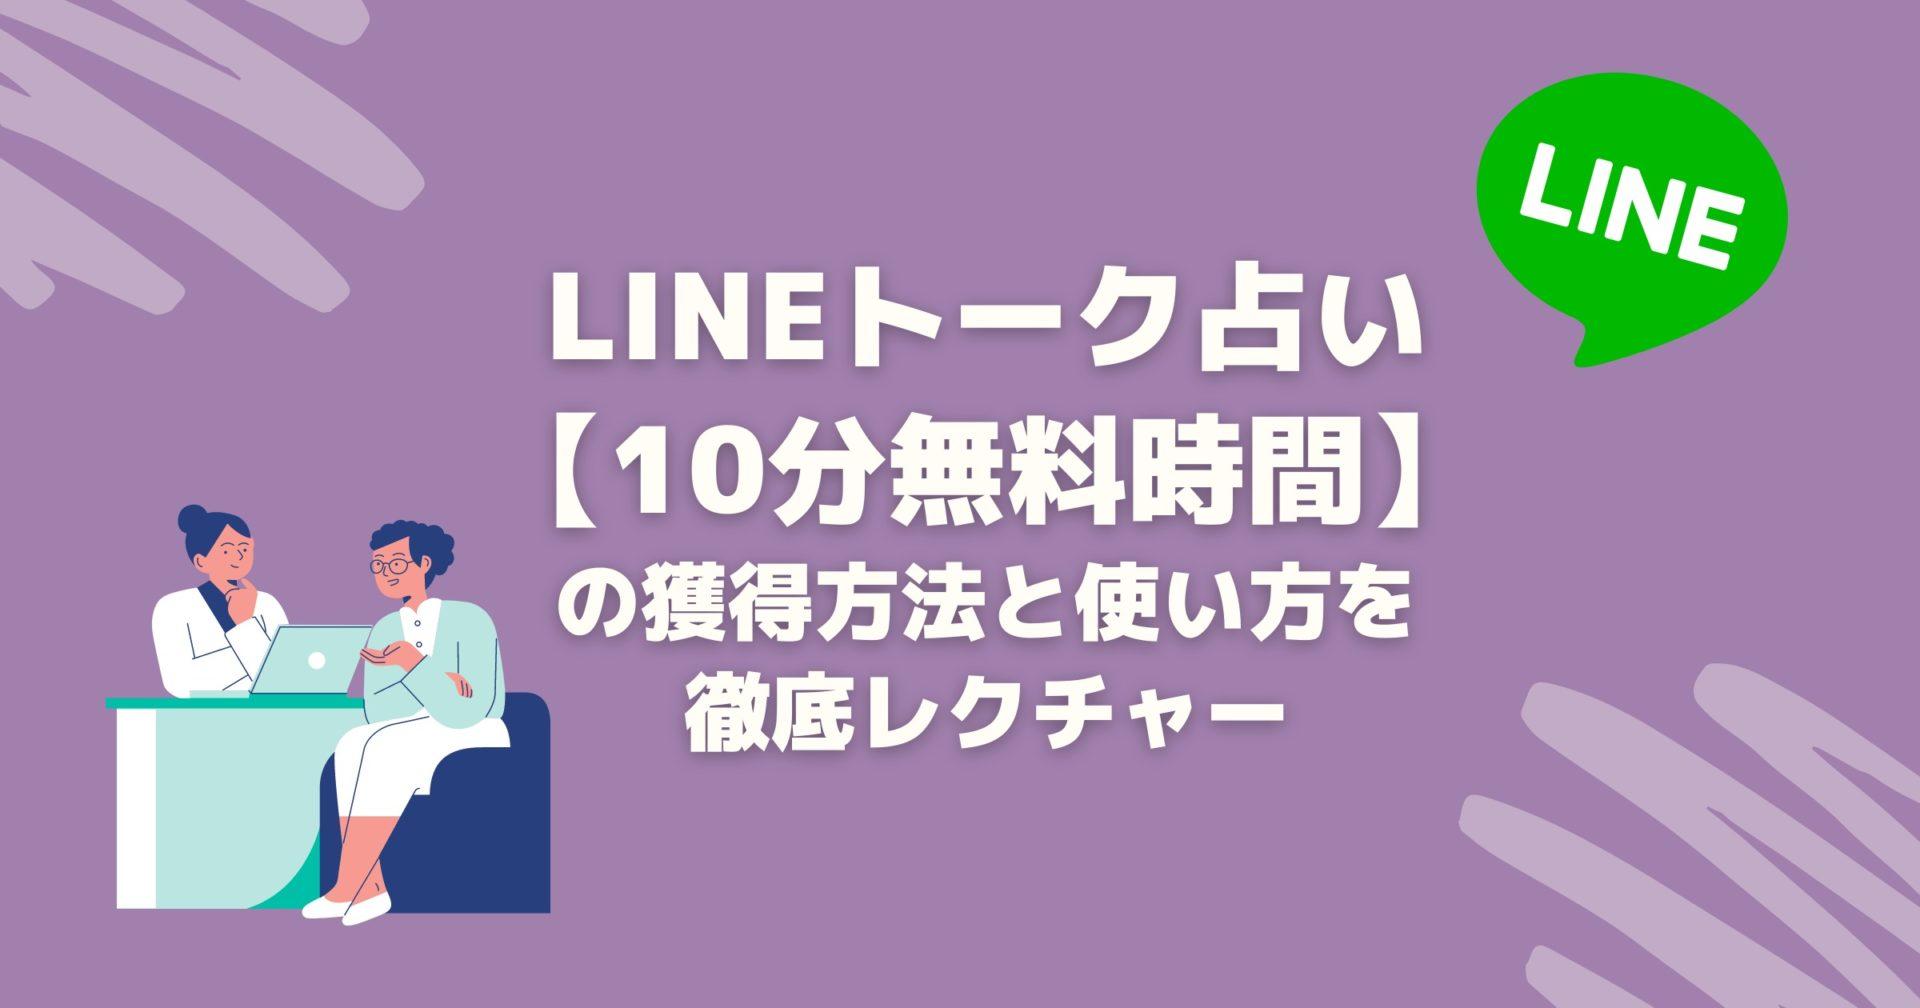 lineトーク占い無料